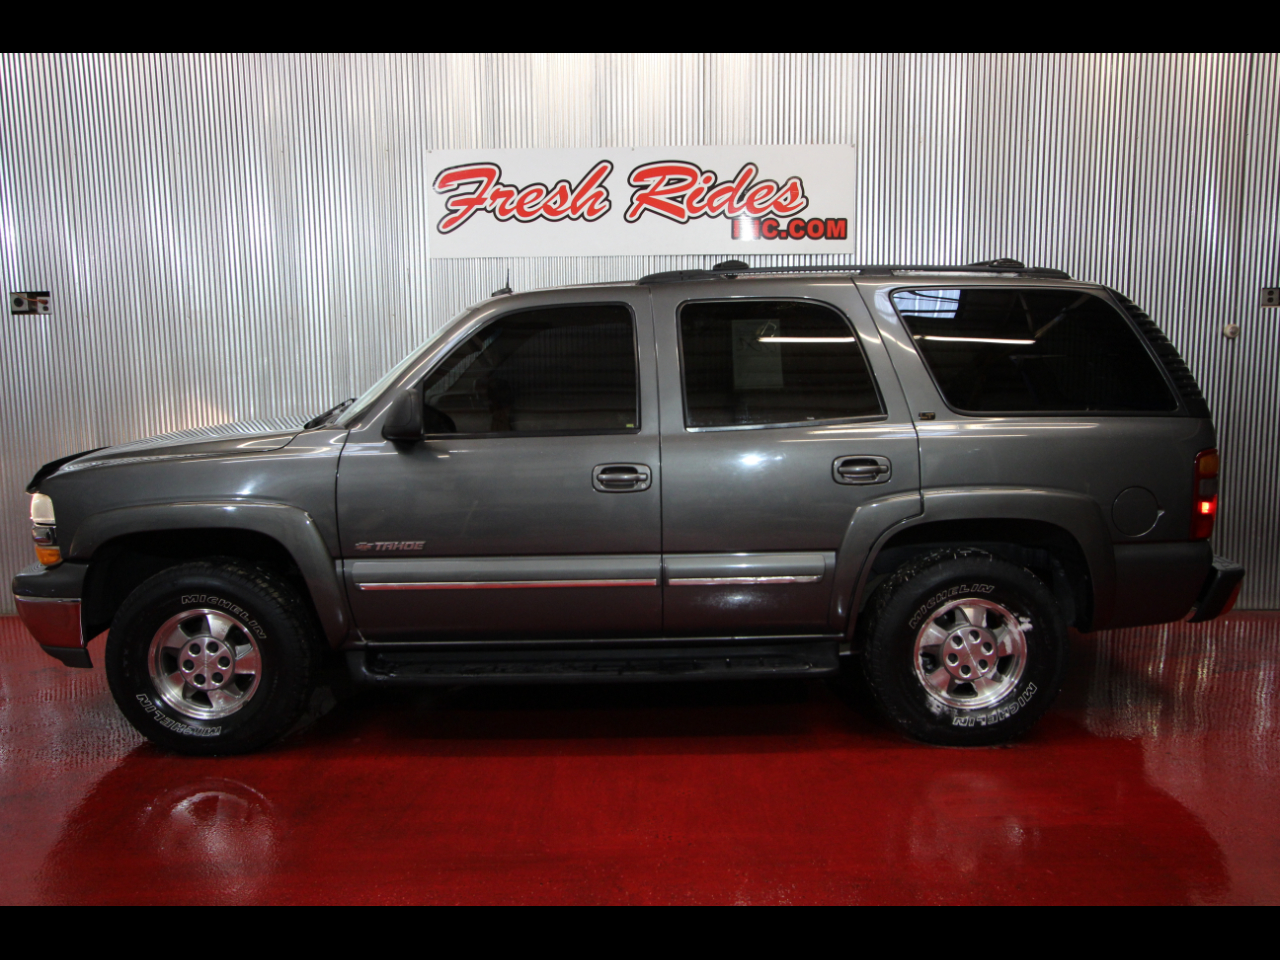 2002 Chevrolet Tahoe LT 4WD